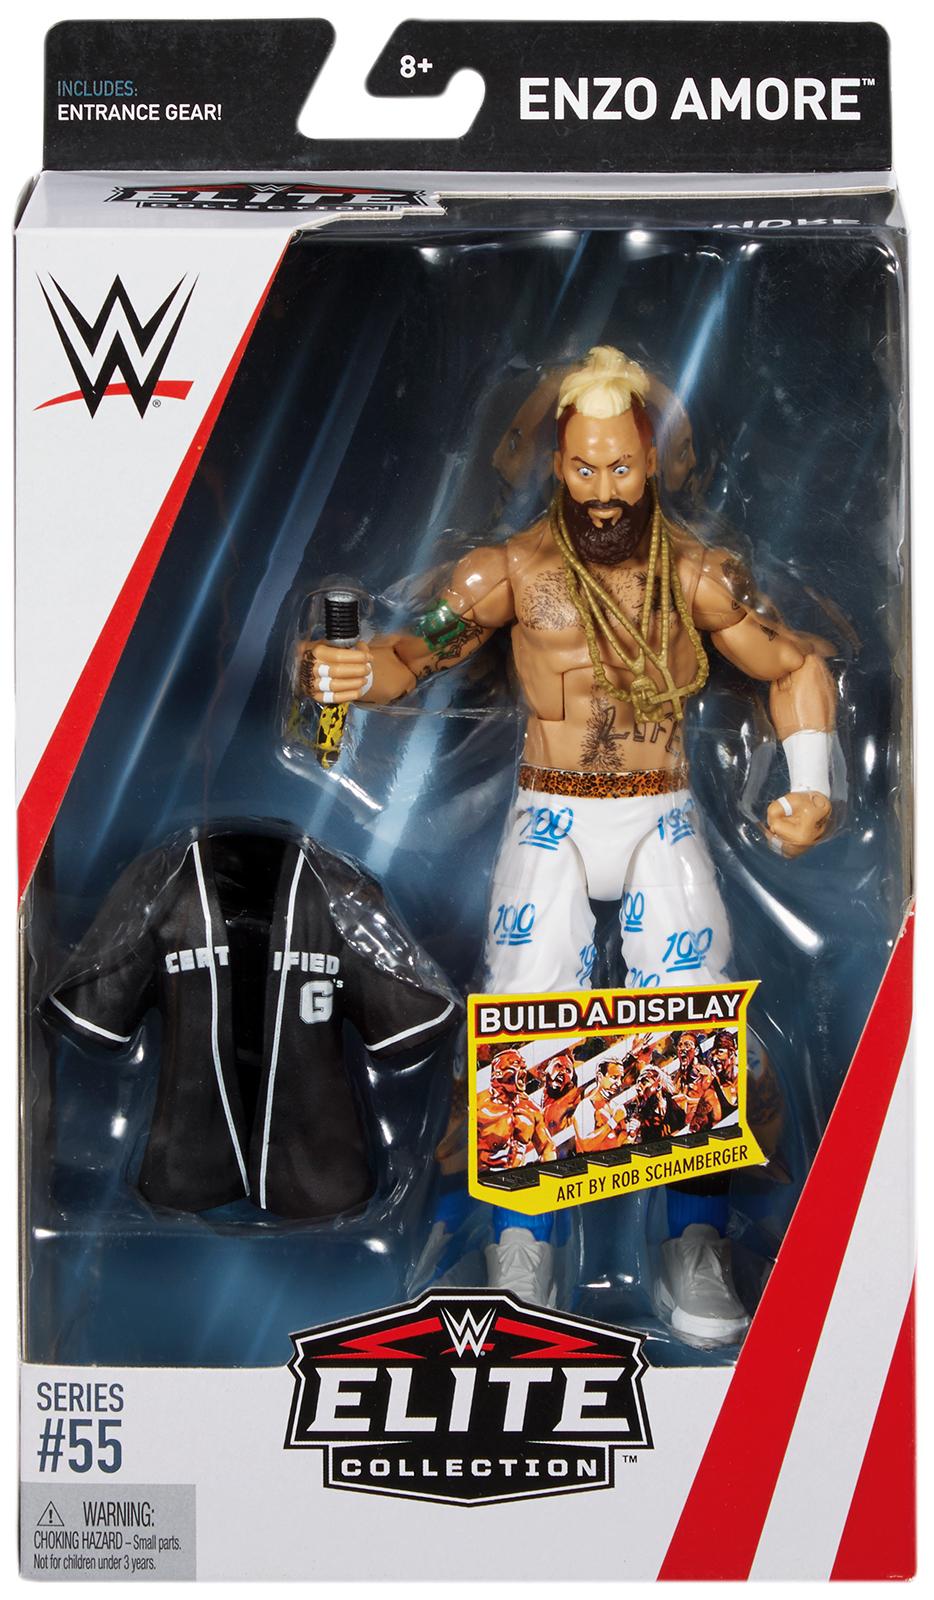 WWE Enzo Amore Elite 55 Toy Wrestling Action Figure